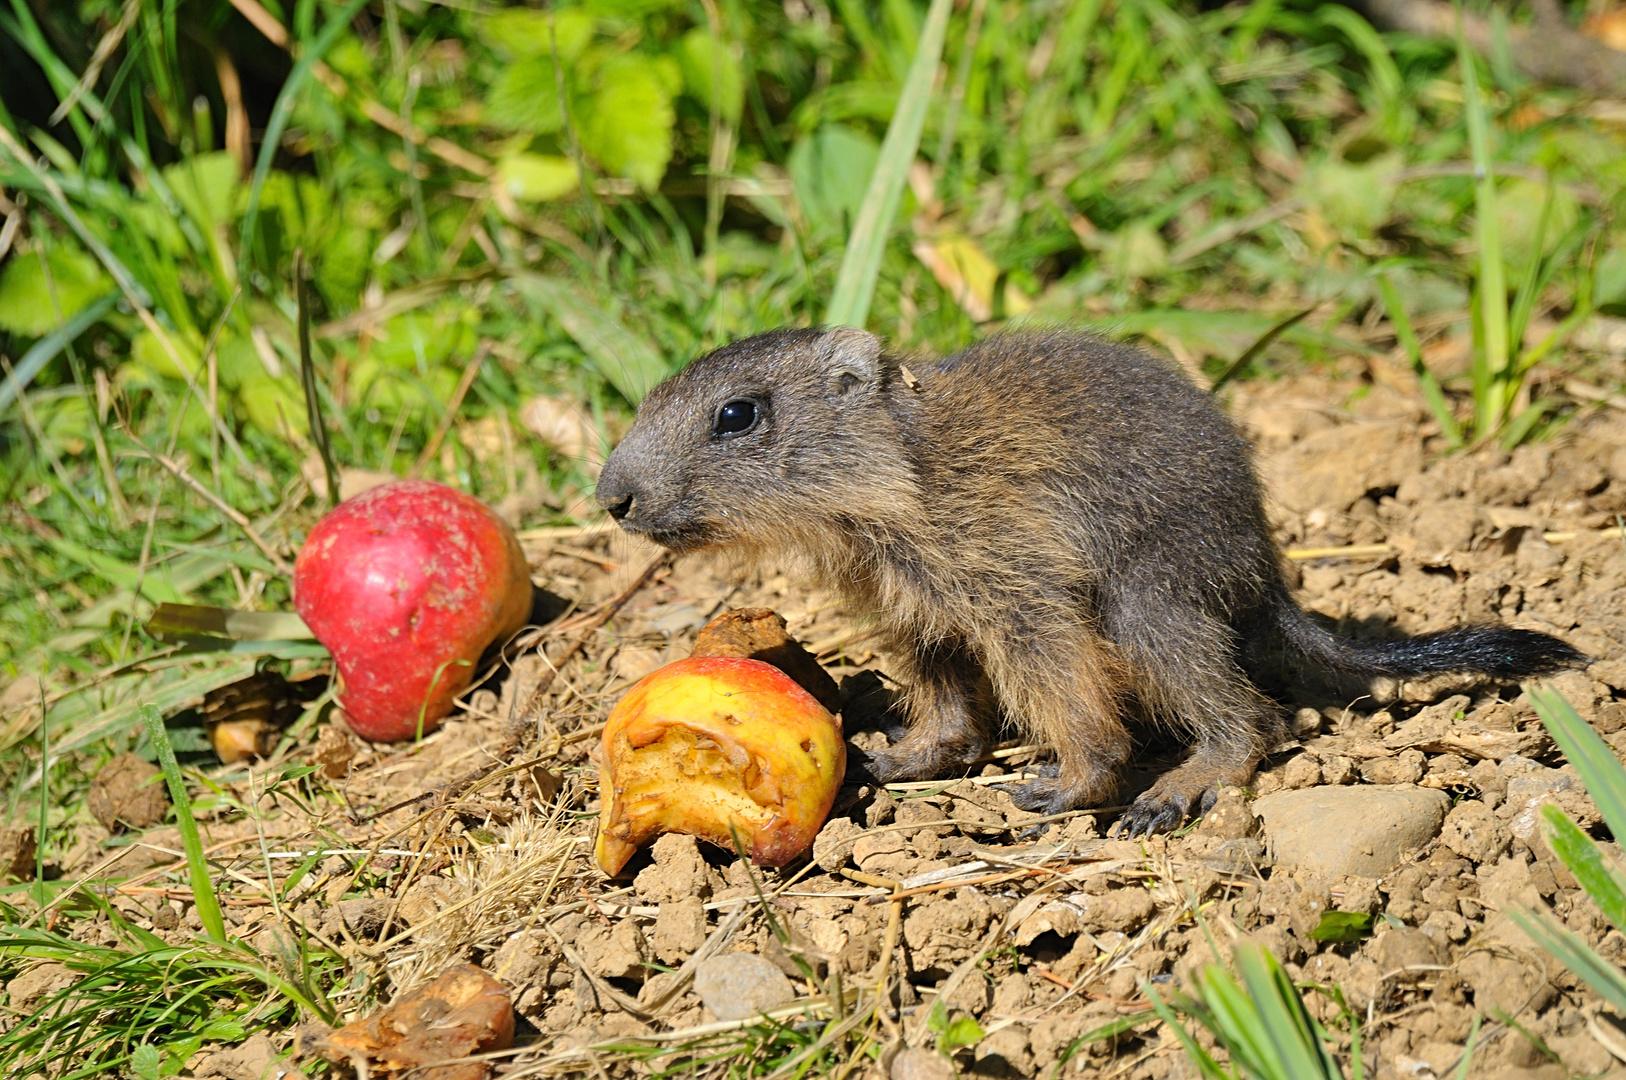 Junges Murmeltier vor dem Fressen